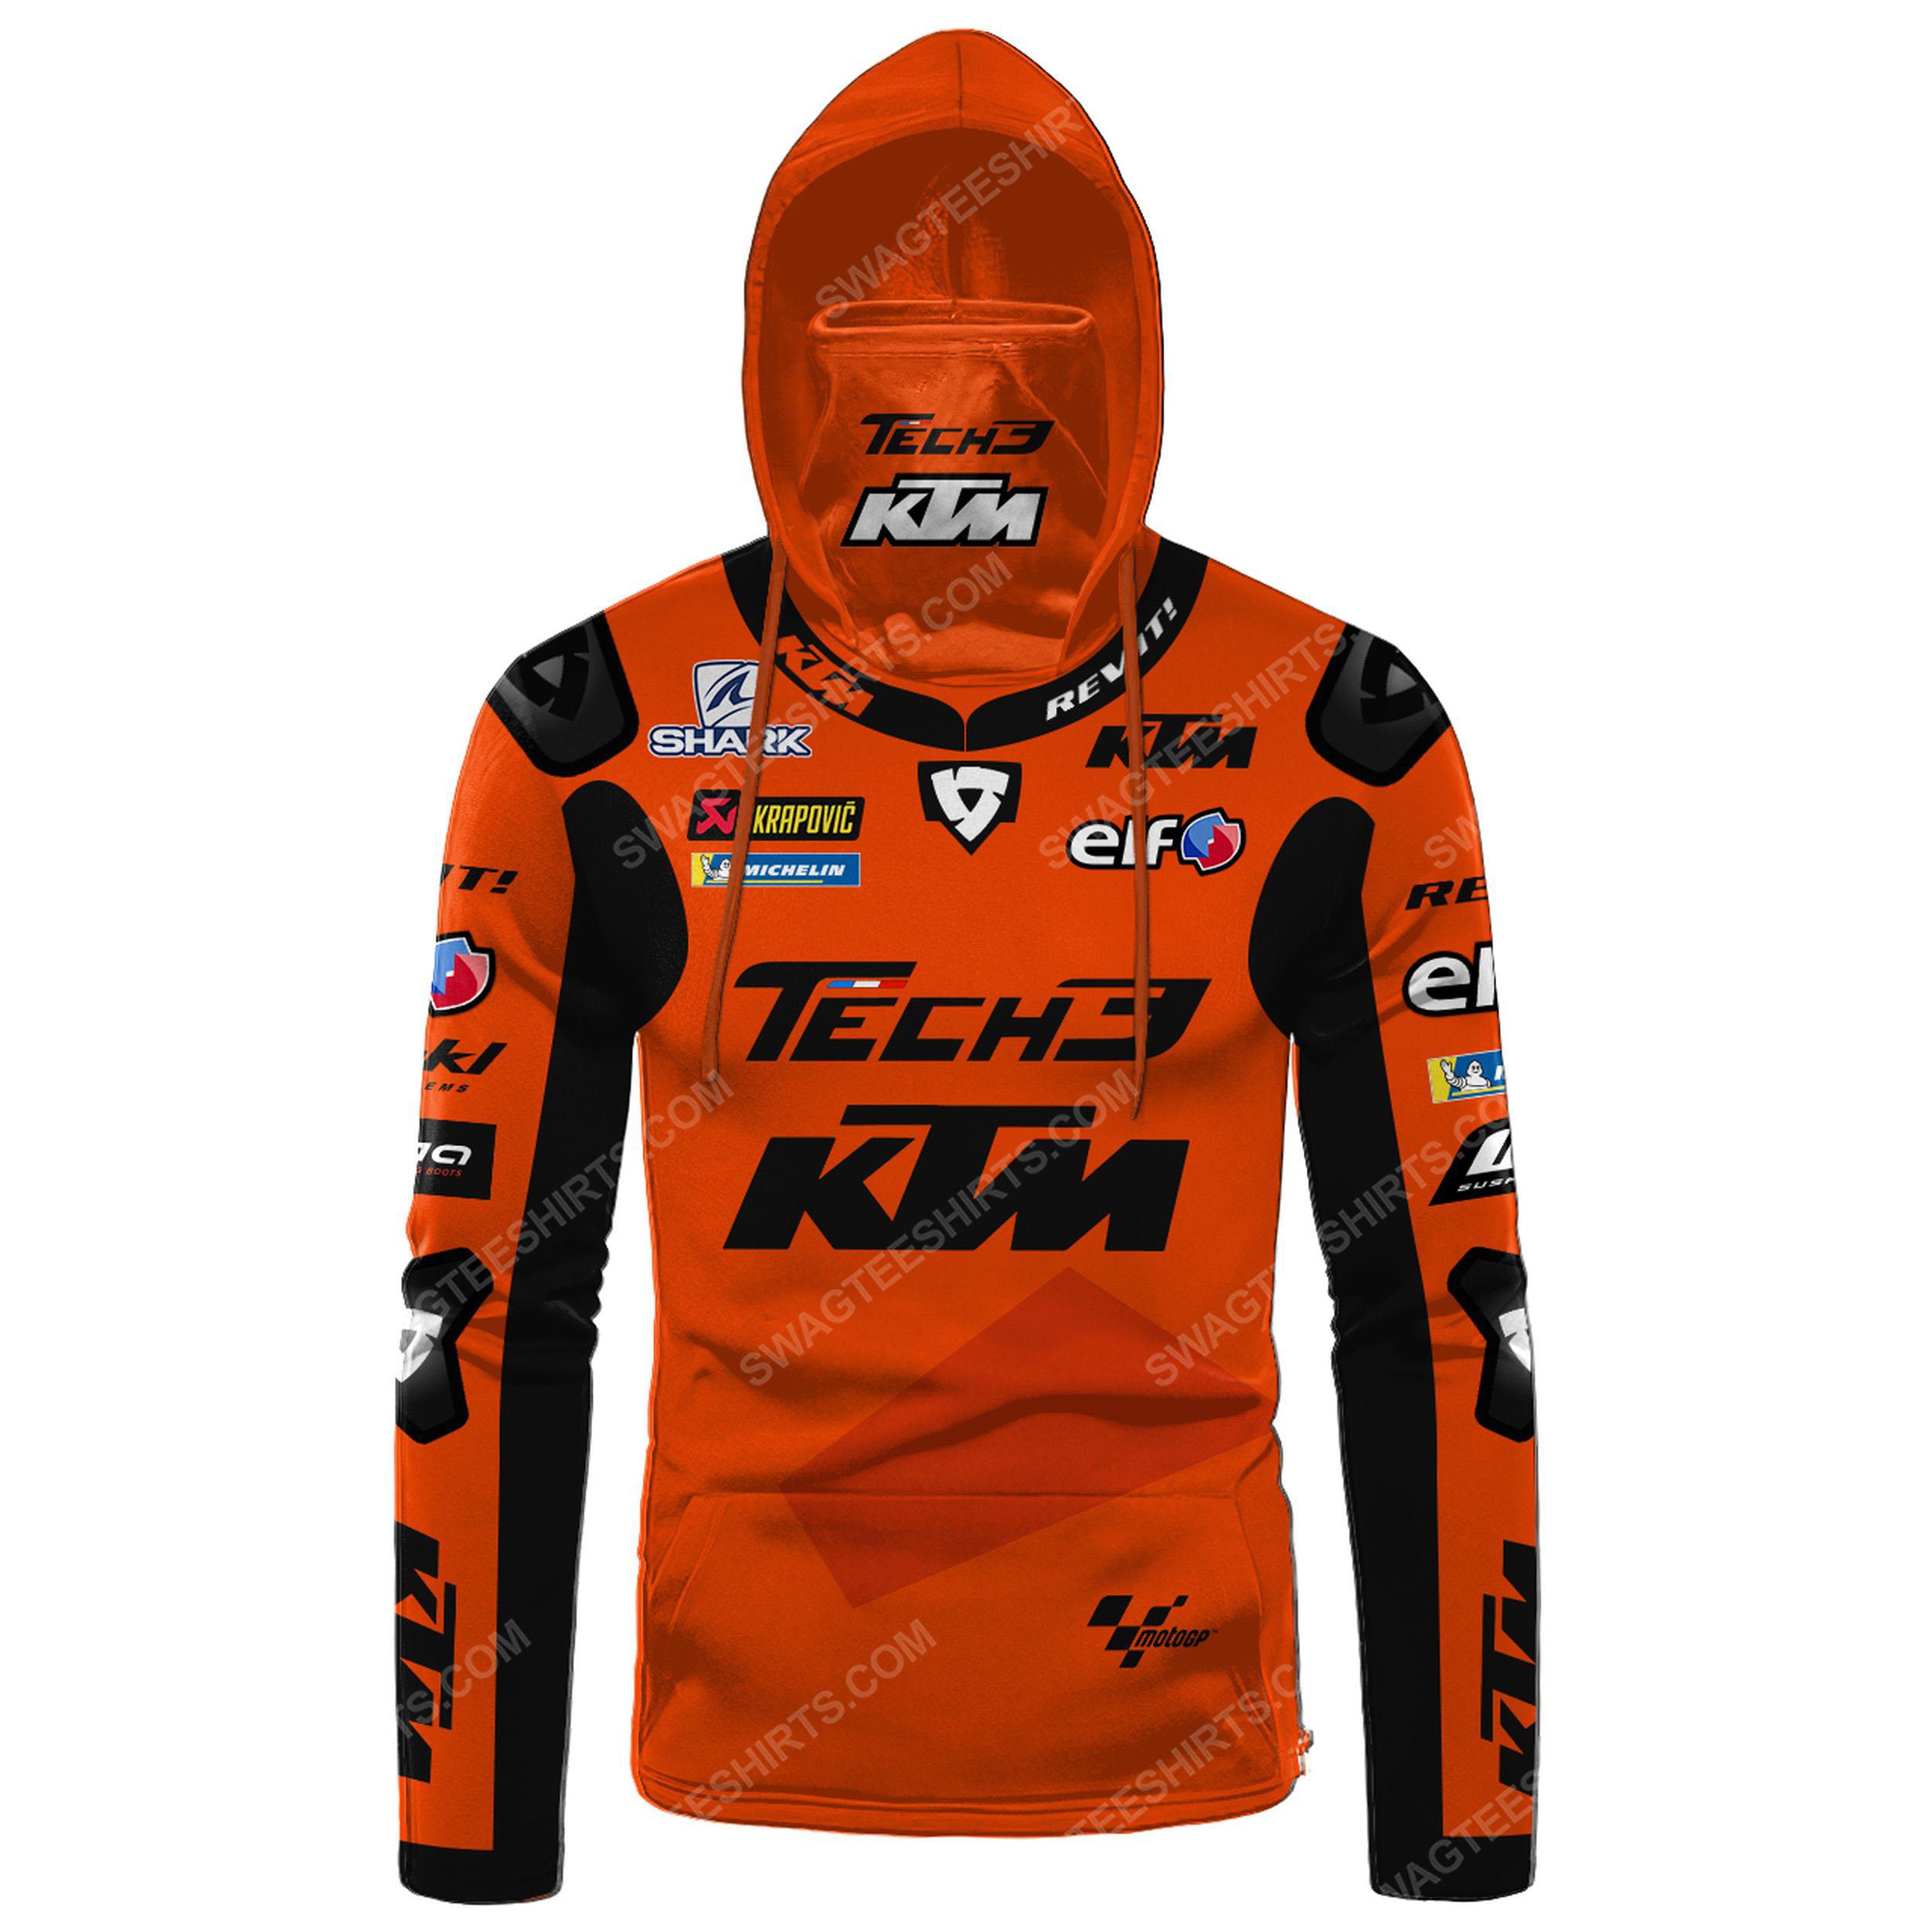 Custom name tech3 ktm factory racing full print mask hoodie 2(1)